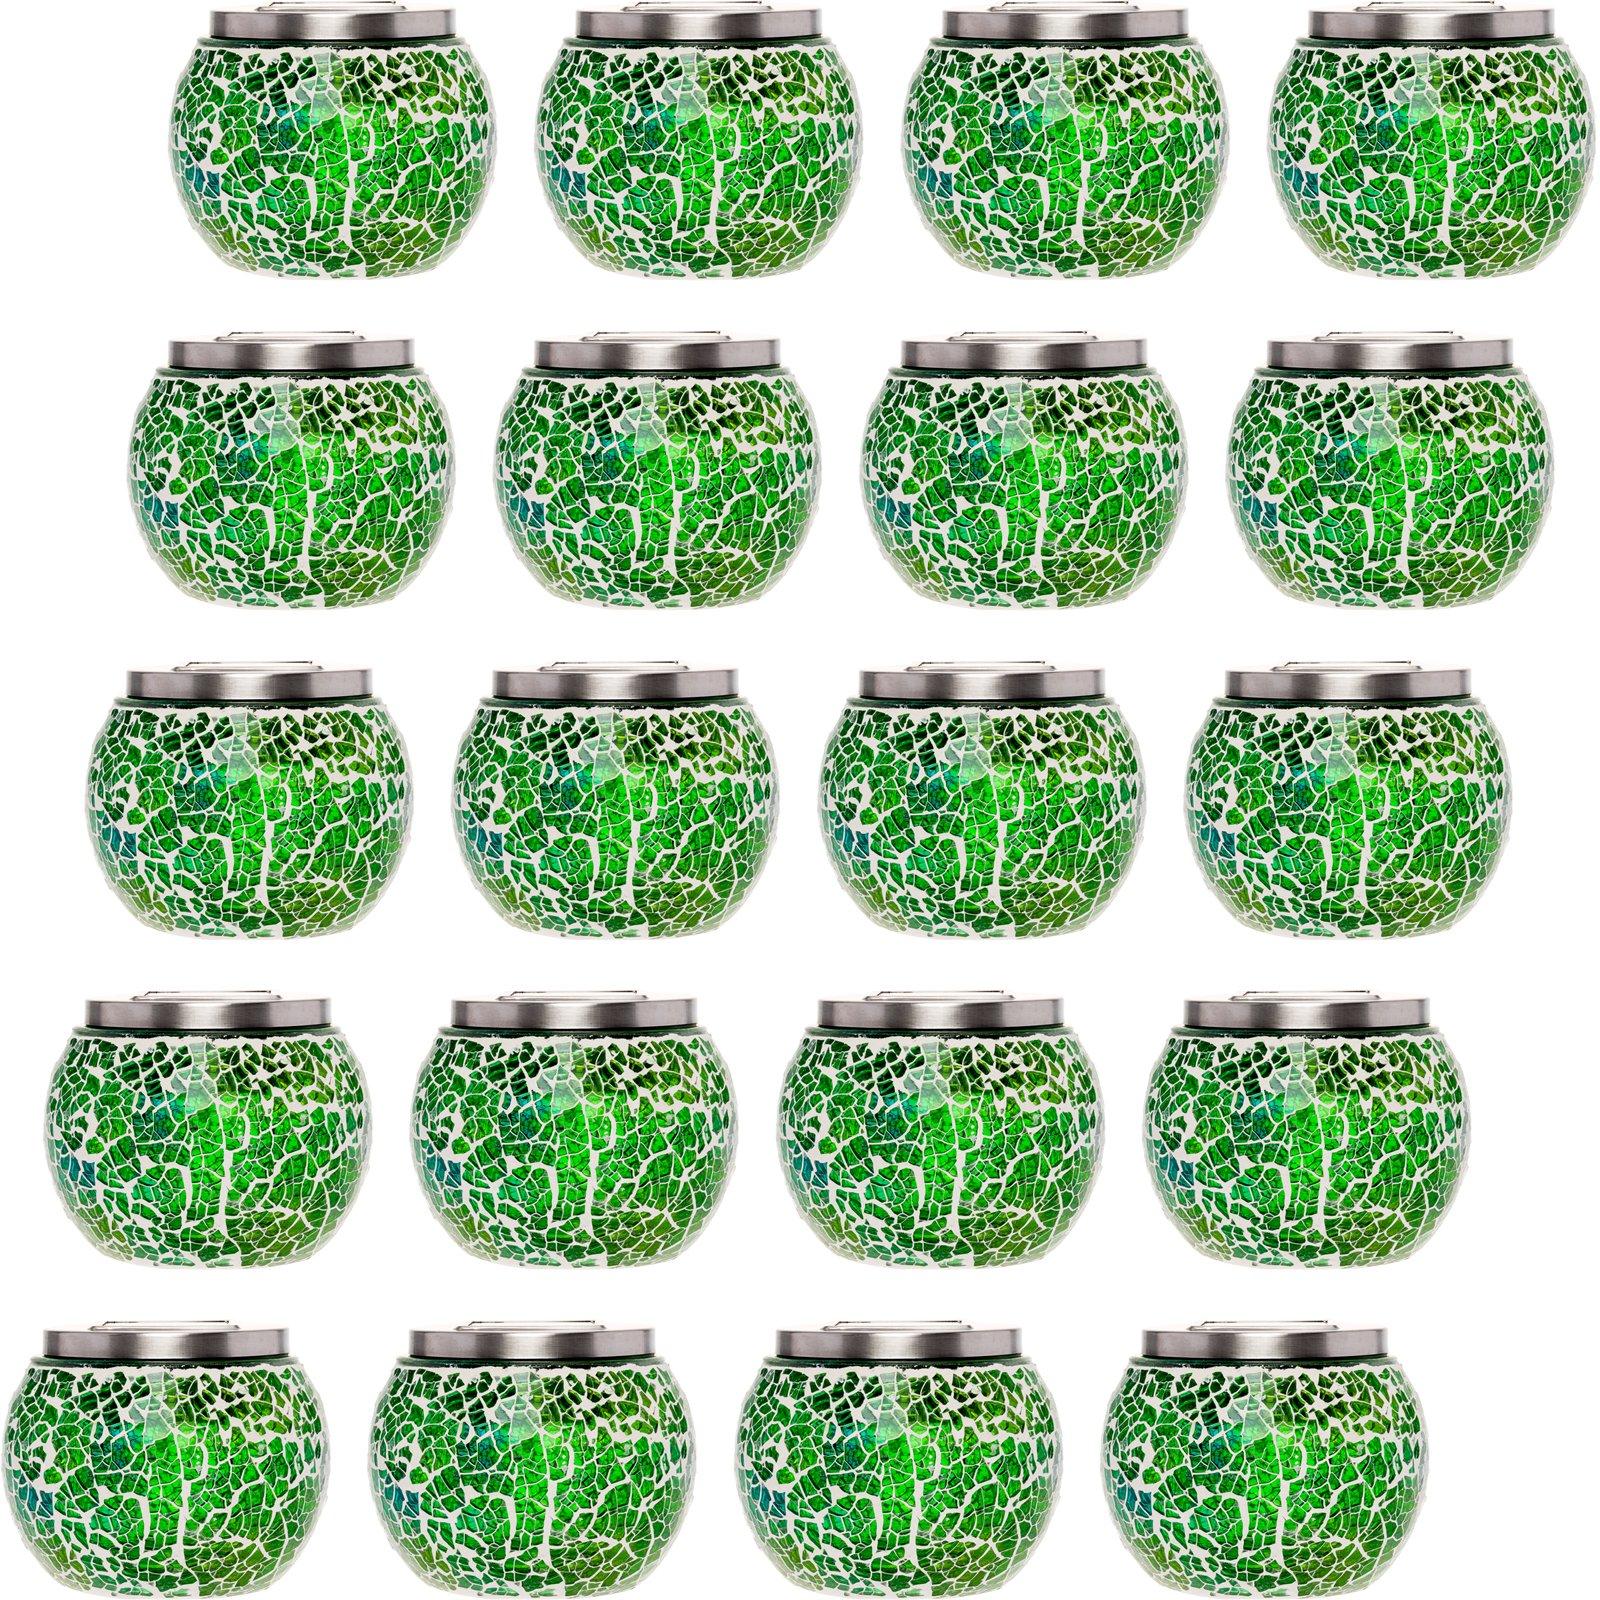 20 Pack Mosaic Solar Light - Decorative LED Outdoor Garden Table Ball Light by GreenLighting (Green)